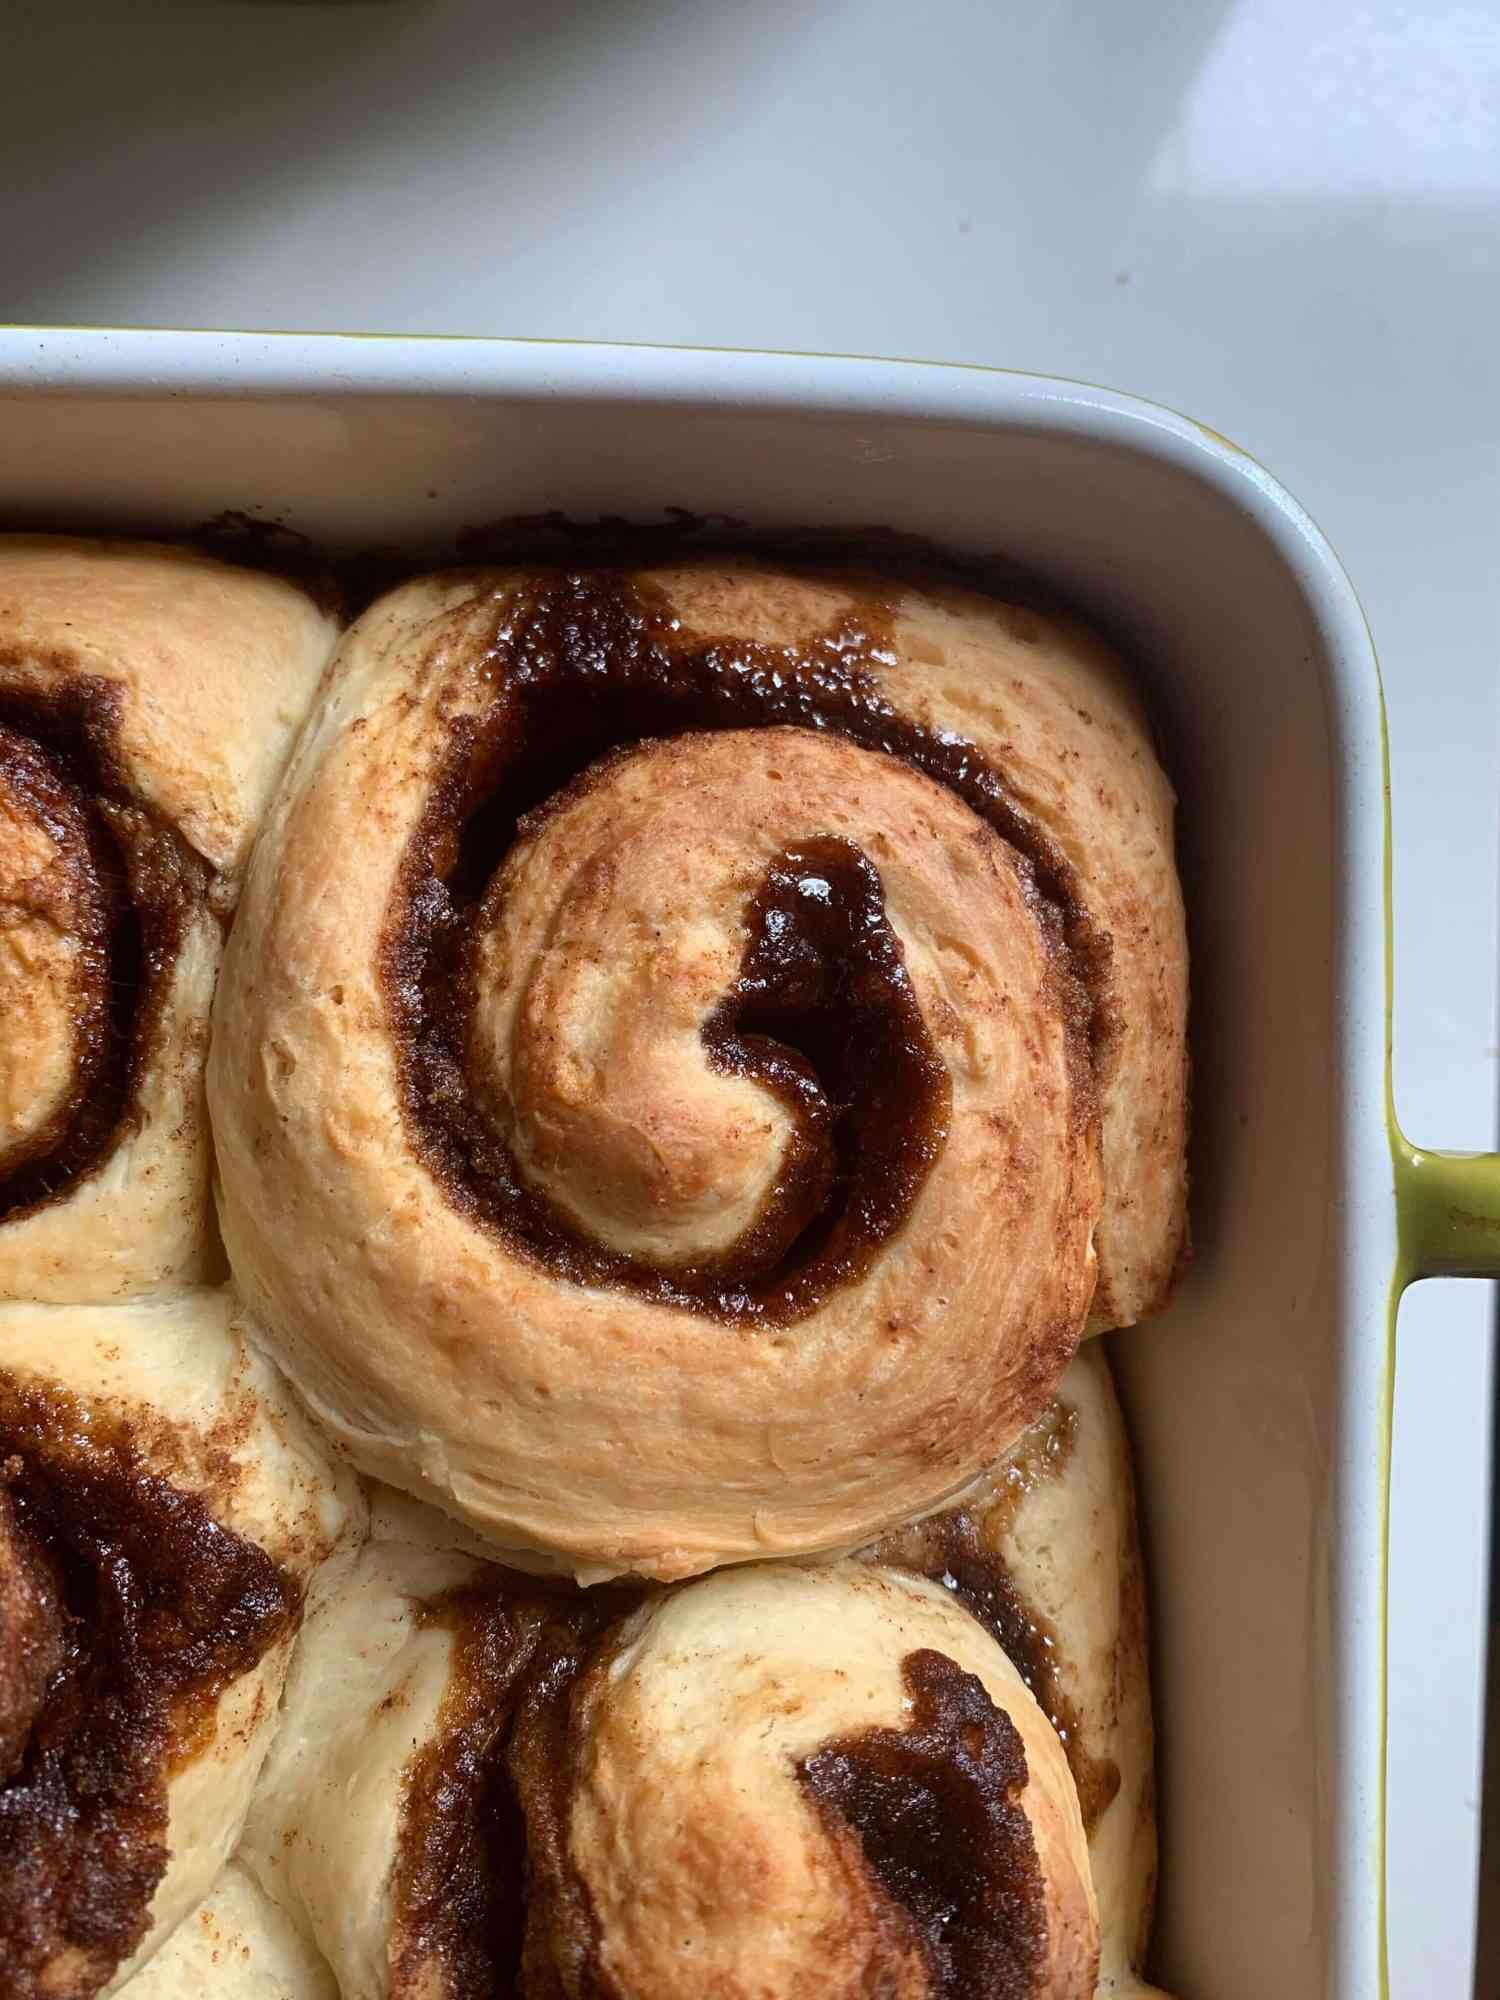 cinnamon buns in a caking dish, pre glazing